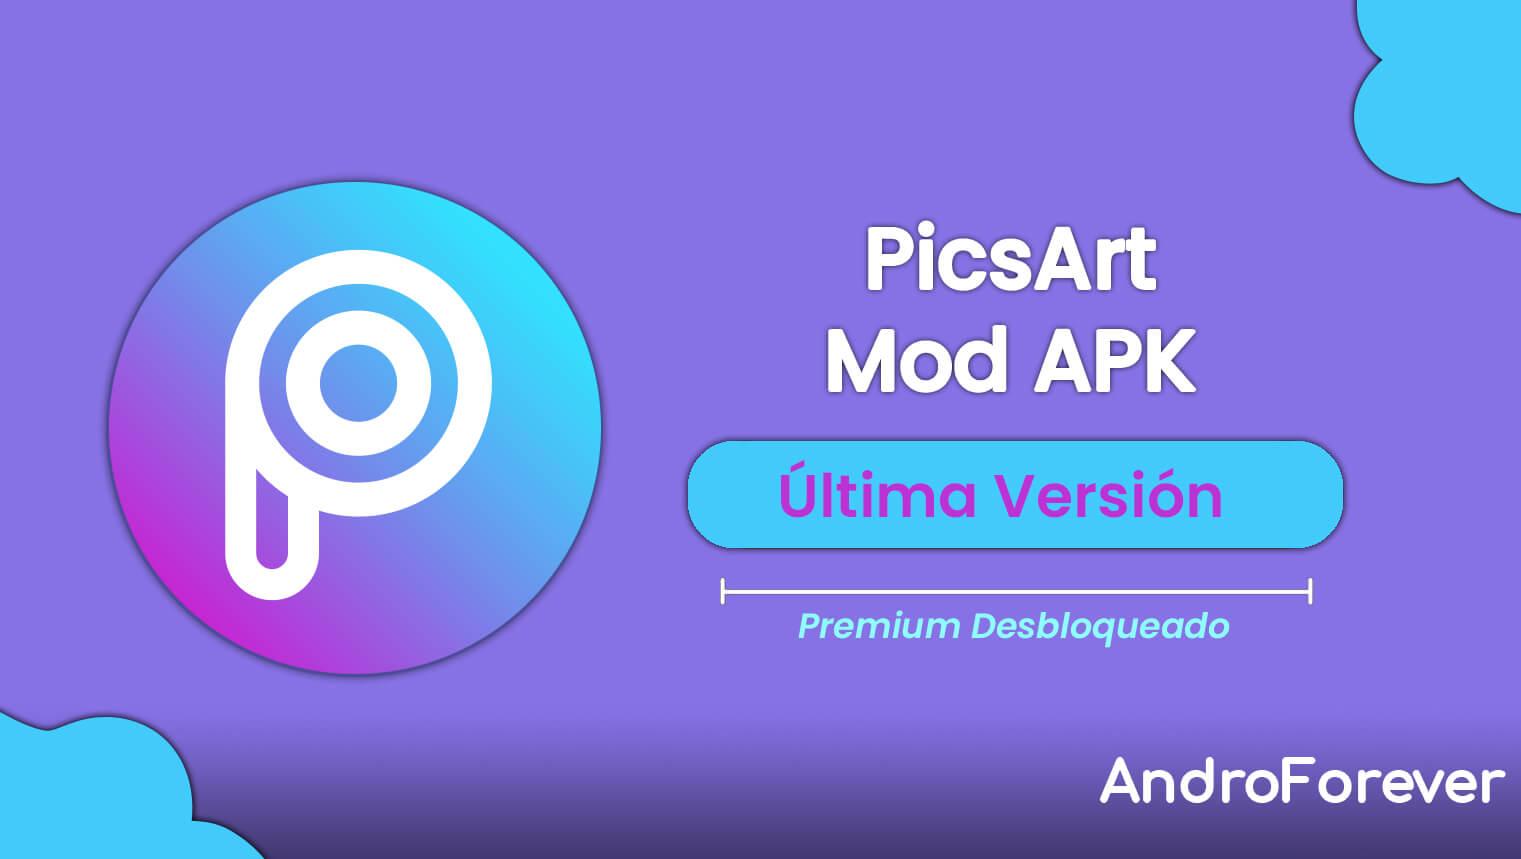 PicsArt APK MOD 17.7.0 (Premium Desbloqueado)